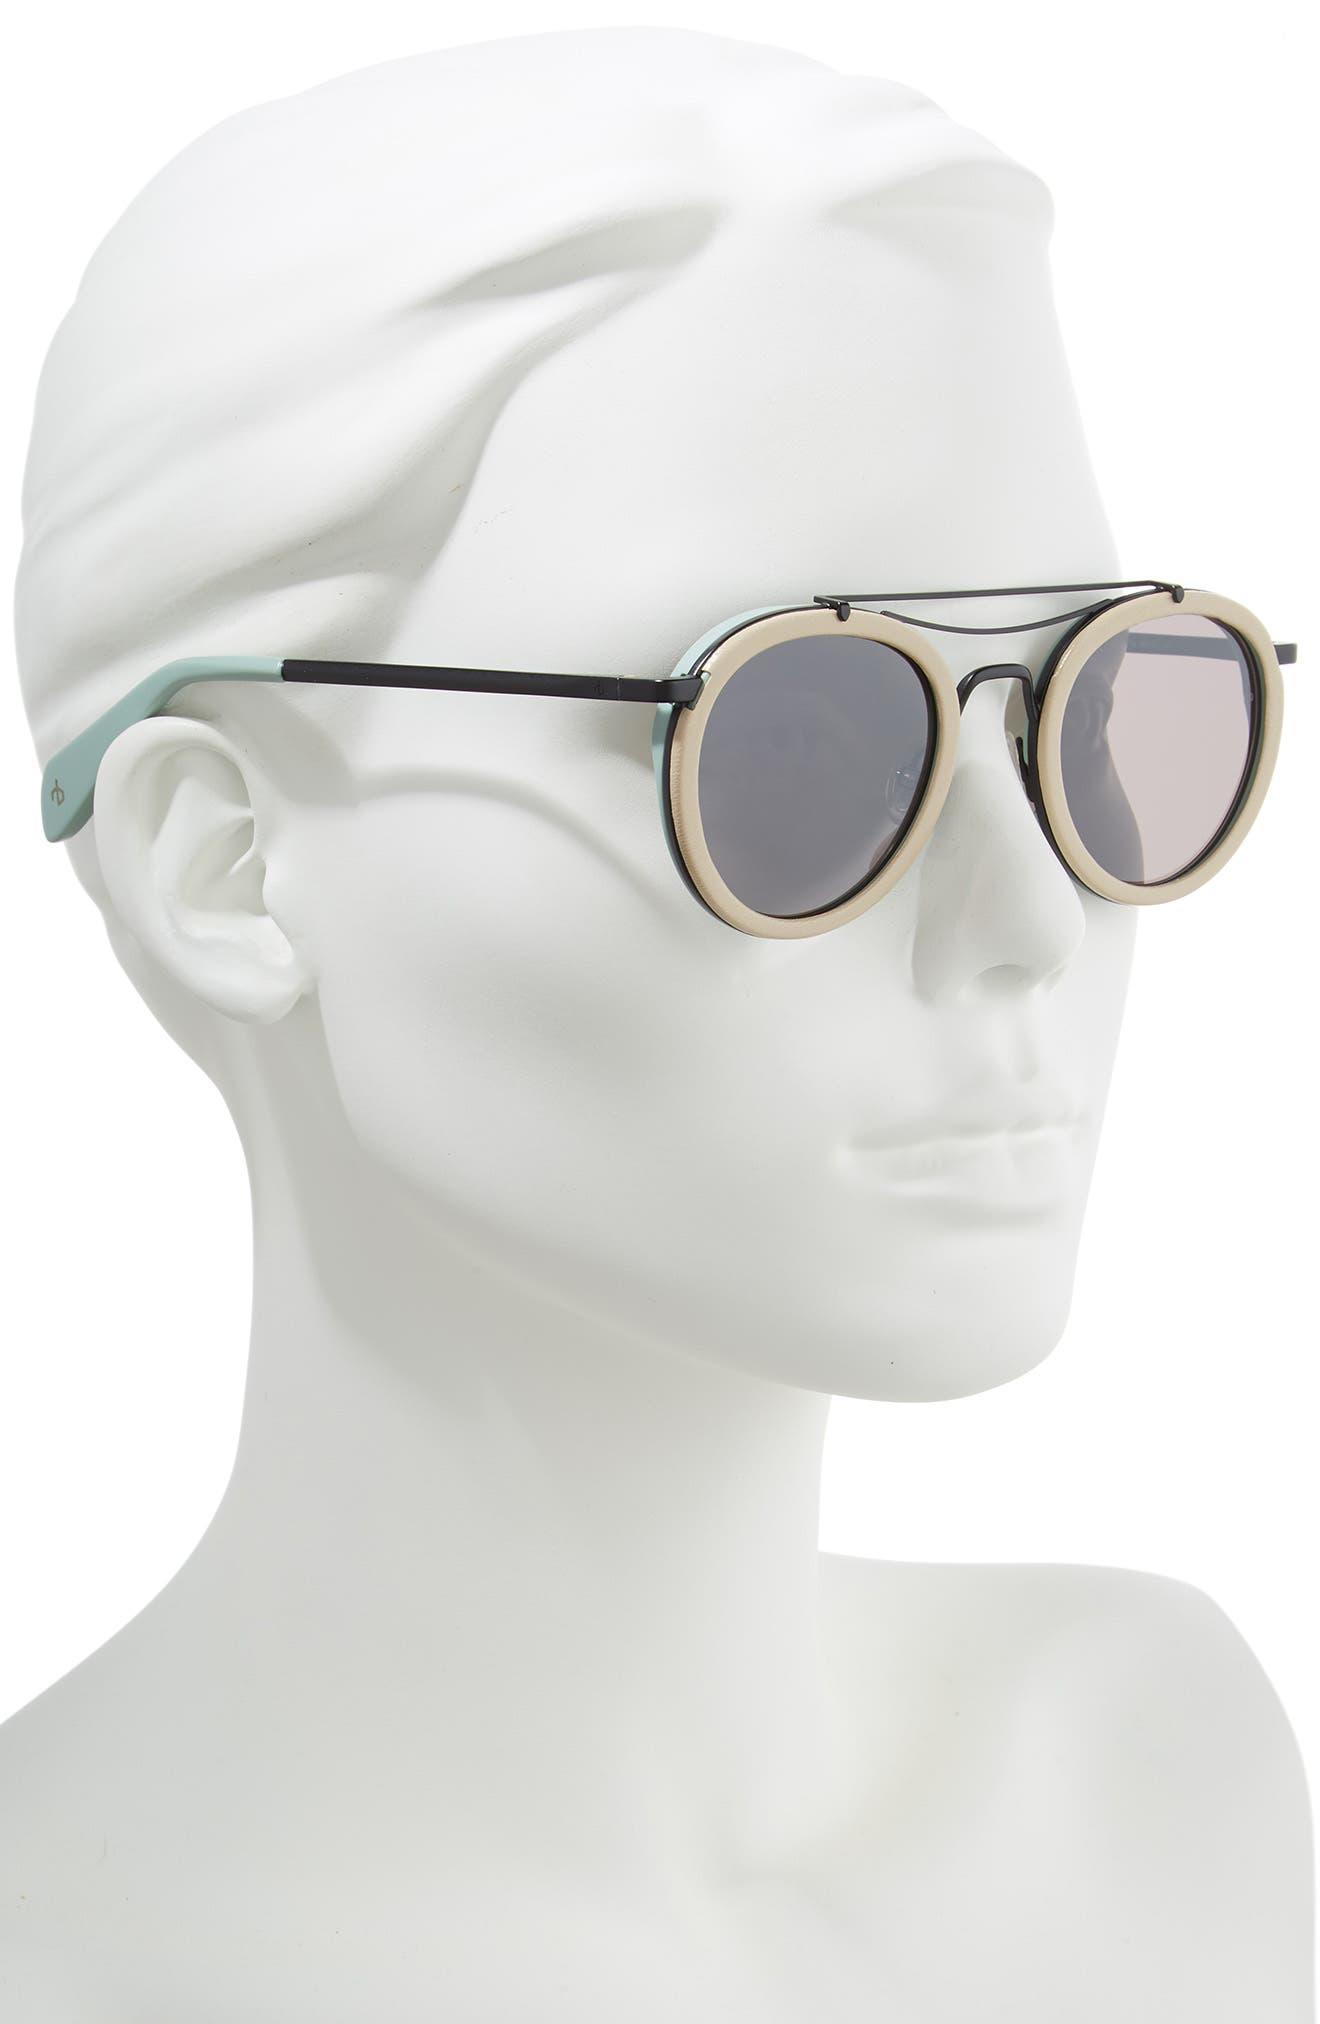 55mm Round Aviator Sunglasses,                             Alternate thumbnail 2, color,                             MATTE BLACK BEIGE